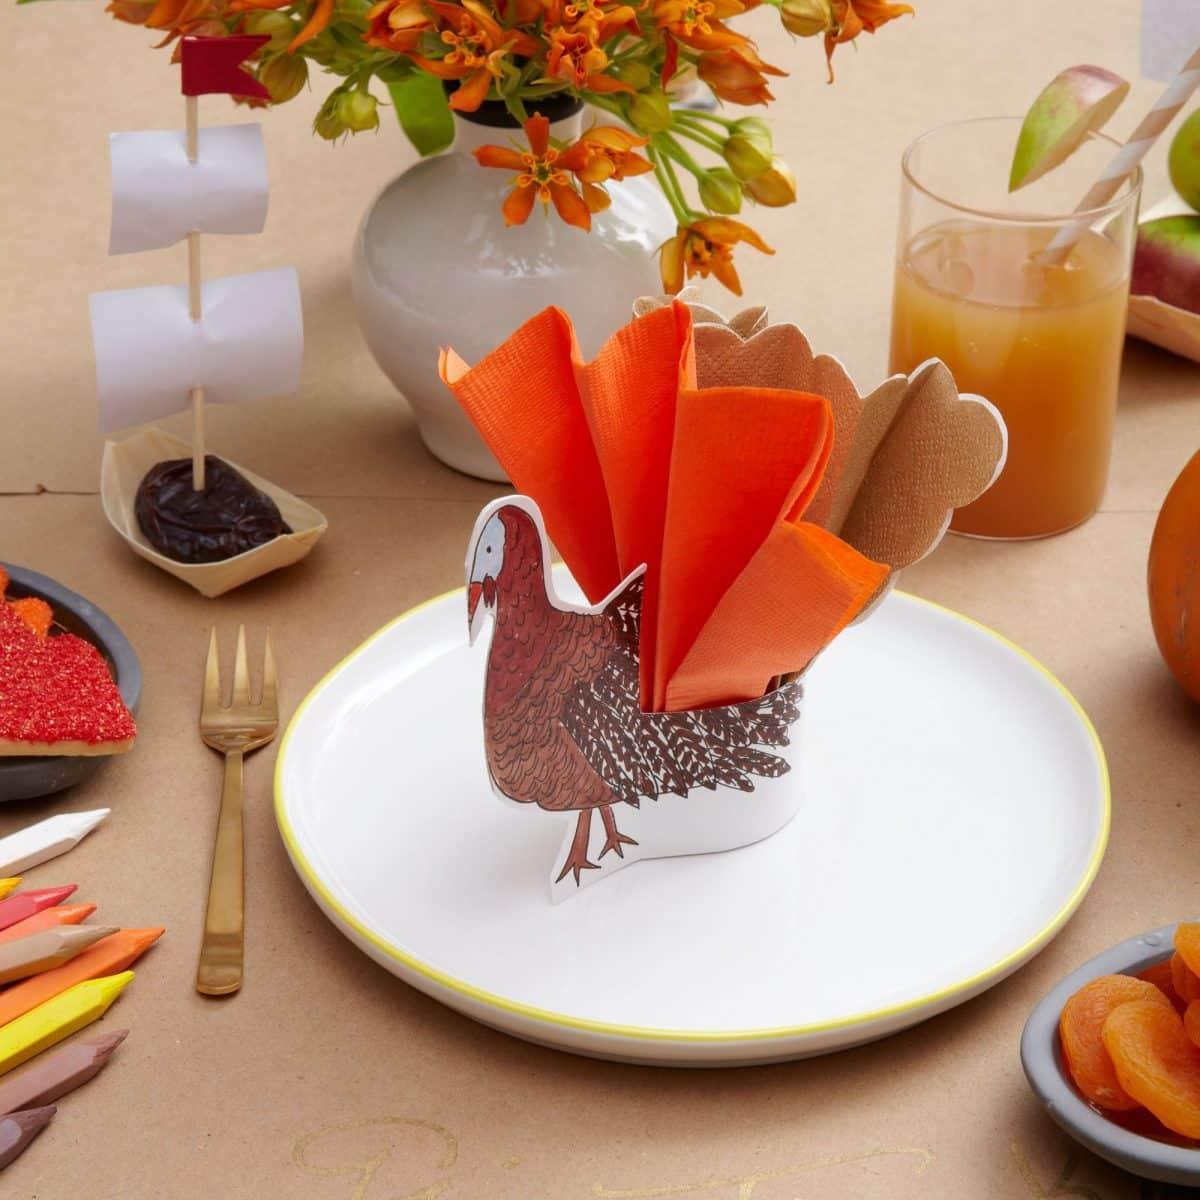 Darcy Miller Designs Thanksgiving Kid's Table Thanksgiving, Kids Table, Paper Craft, Coloring, Mayflower, Healthy Snacks, Turkey Craft, Apple Craft, Crab Apples